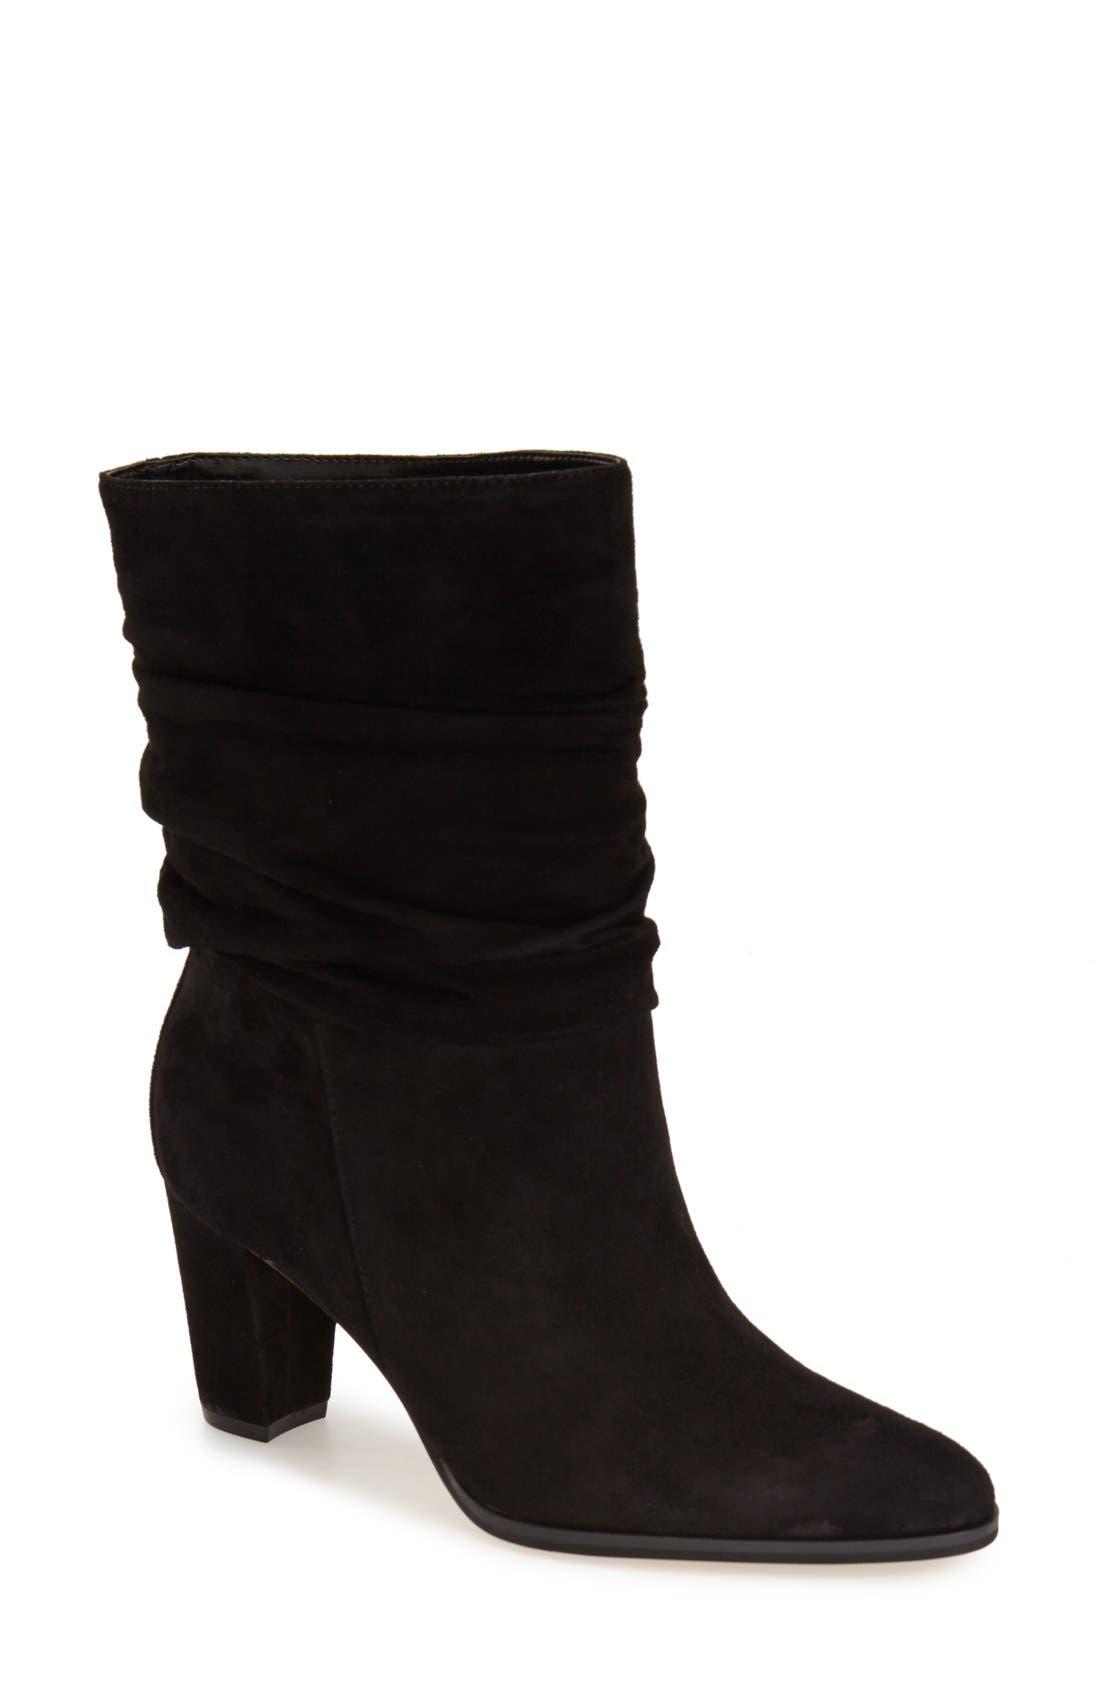 Main Image - IvankaTrump 'Jalli' Ankle Boot (Women)